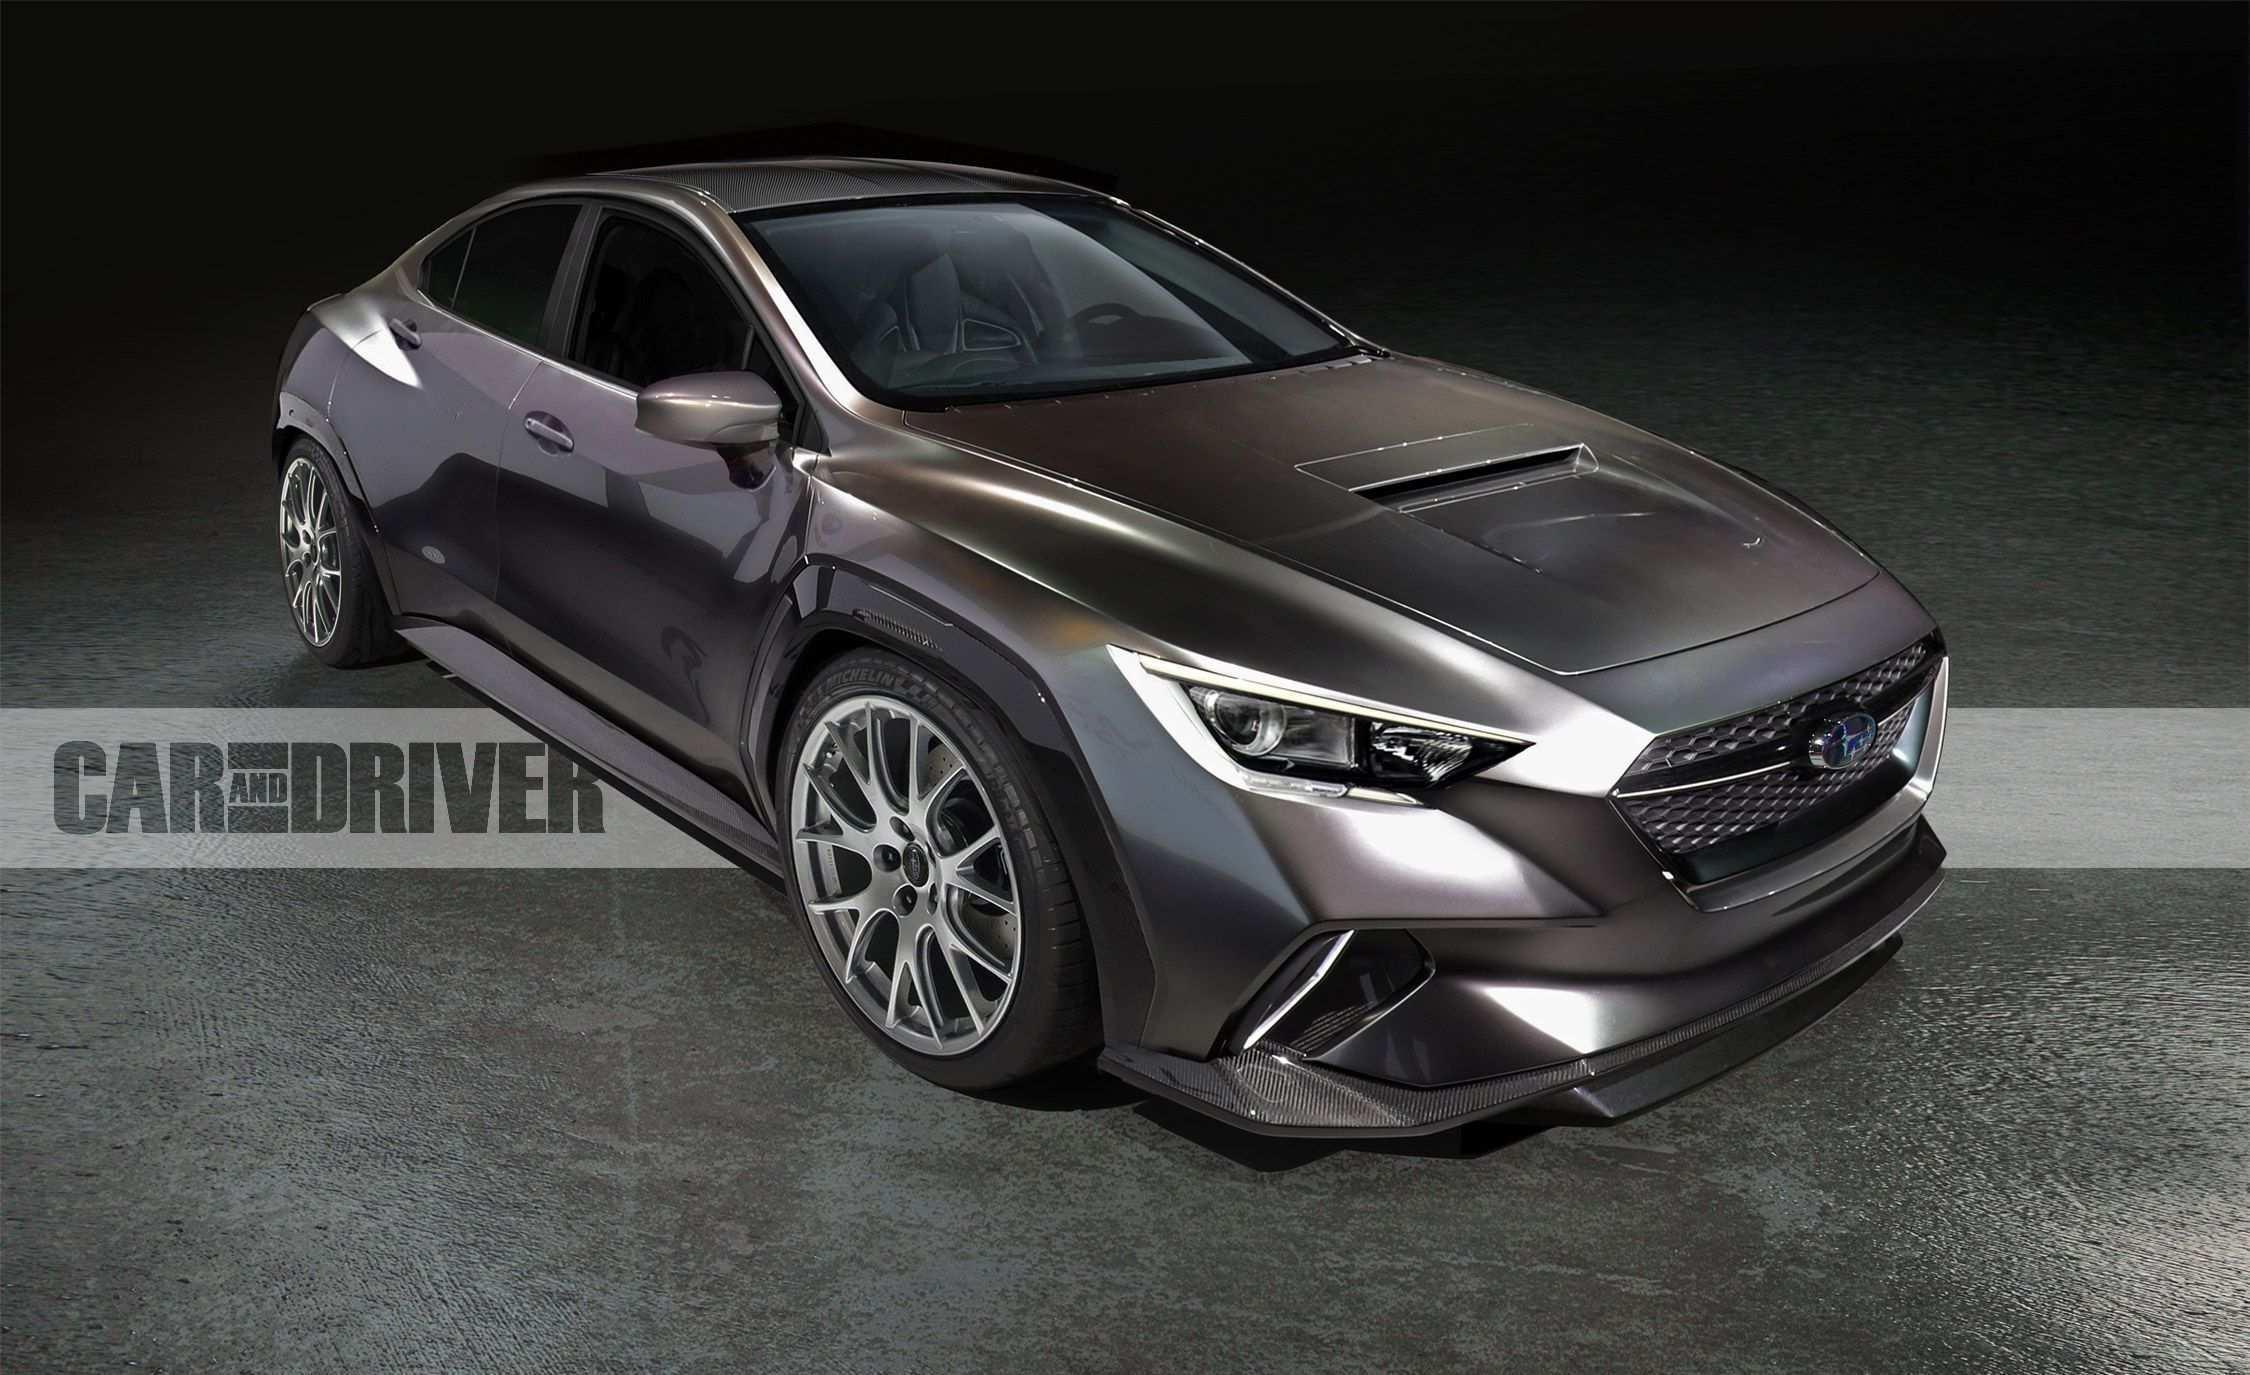 35 Gallery of 2020 Subaru Wrx Sti Hatchback Specs for 2020 Subaru Wrx Sti Hatchback